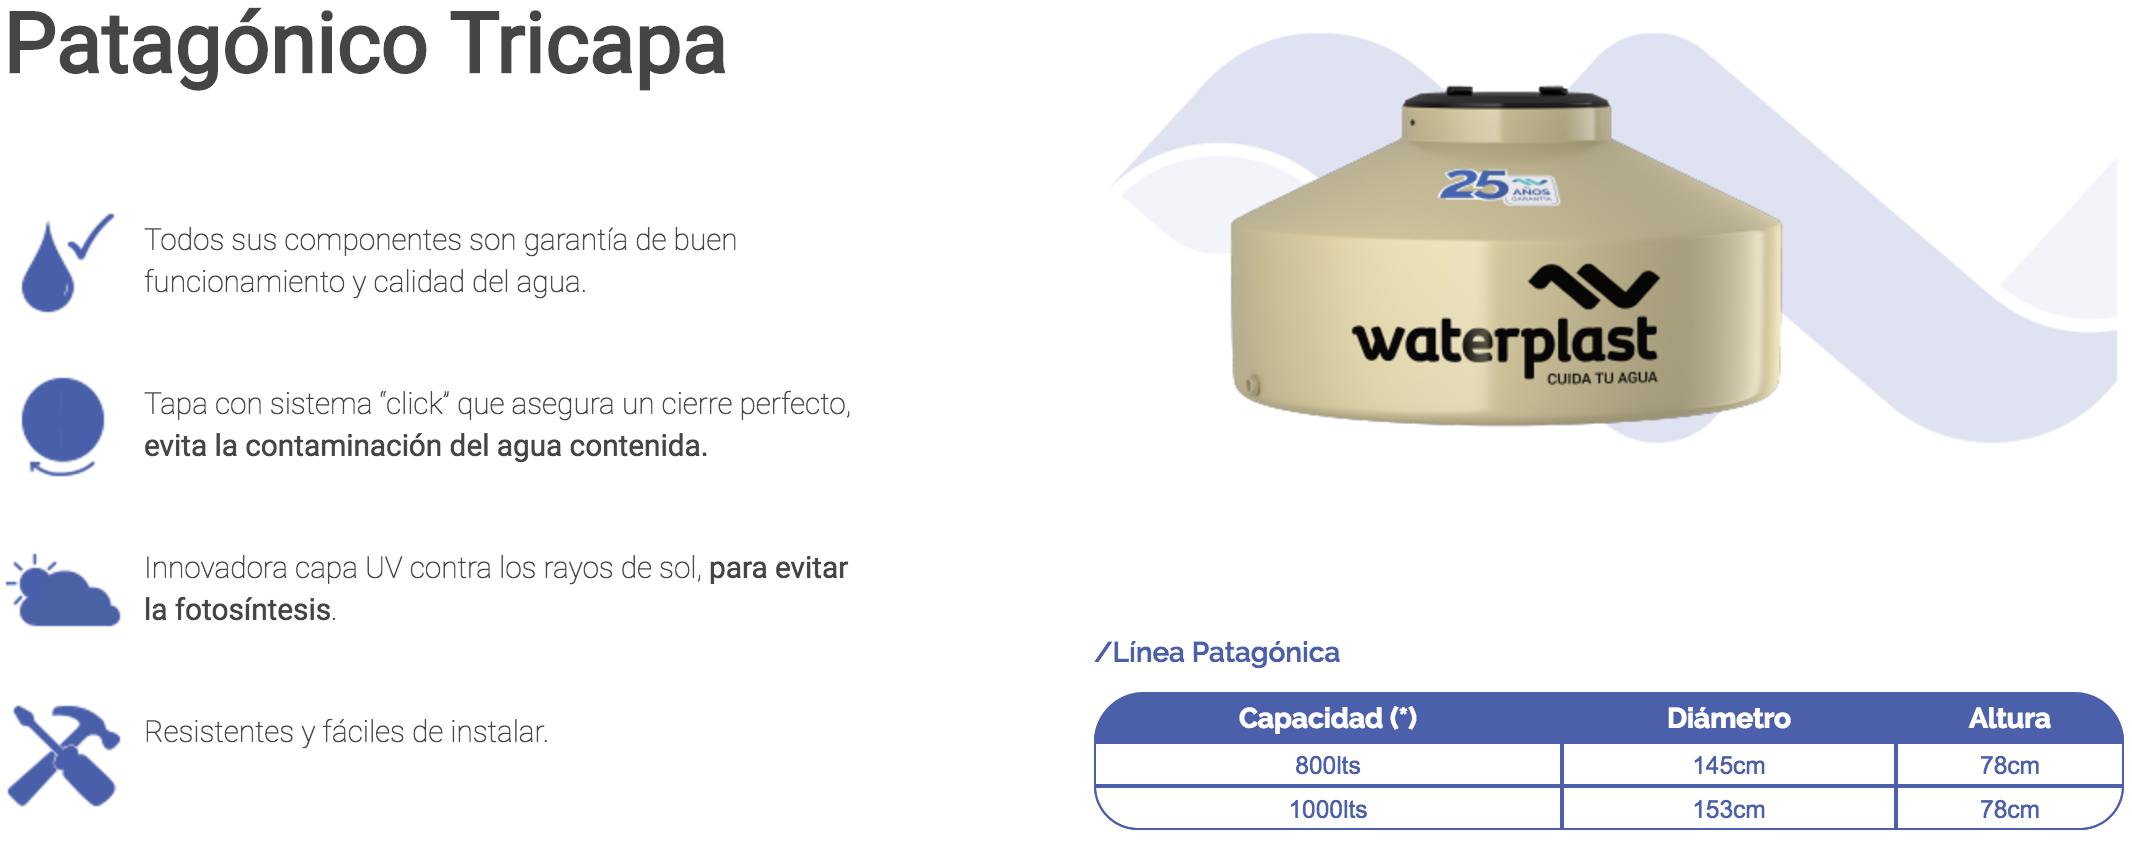 Tanque de Agua Tricapa Patagonico Waterplast 500 Lts